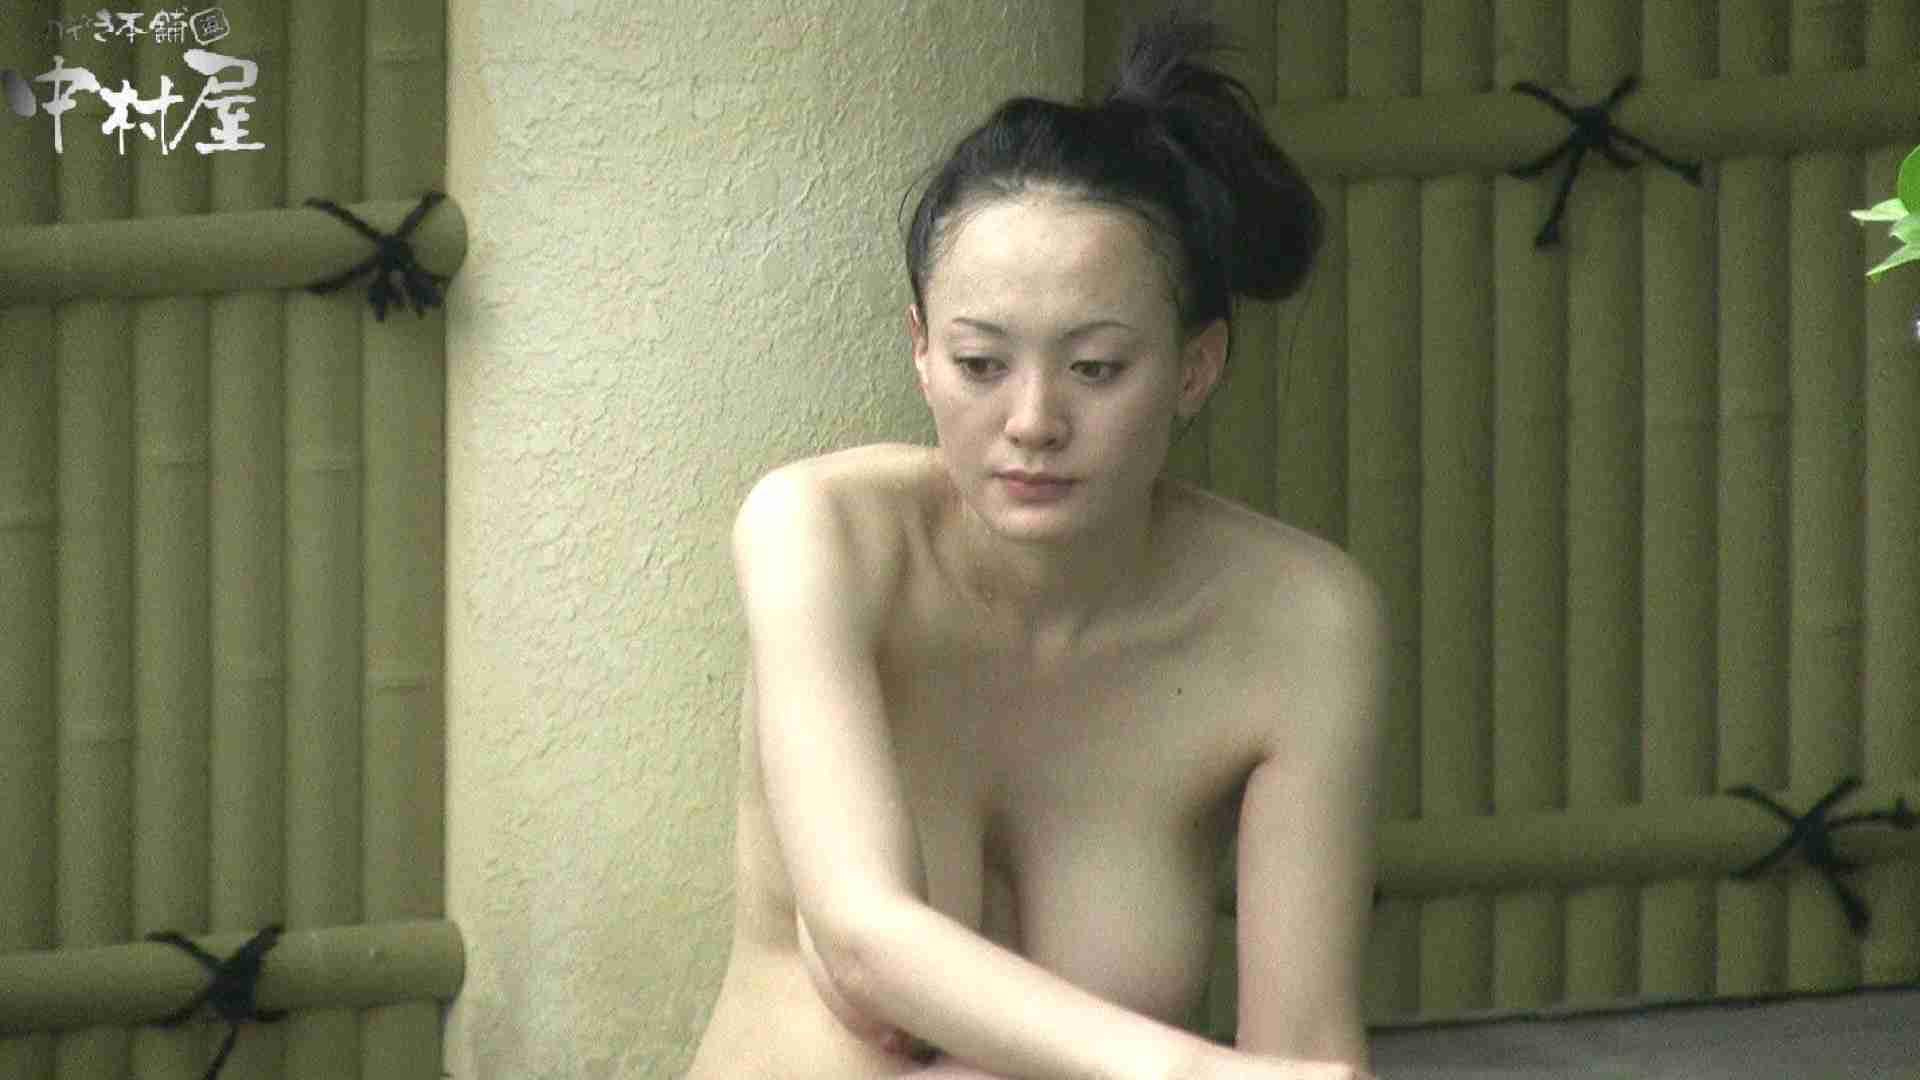 Aquaな露天風呂Vol.903 露天 オメコ無修正動画無料 85pic 4